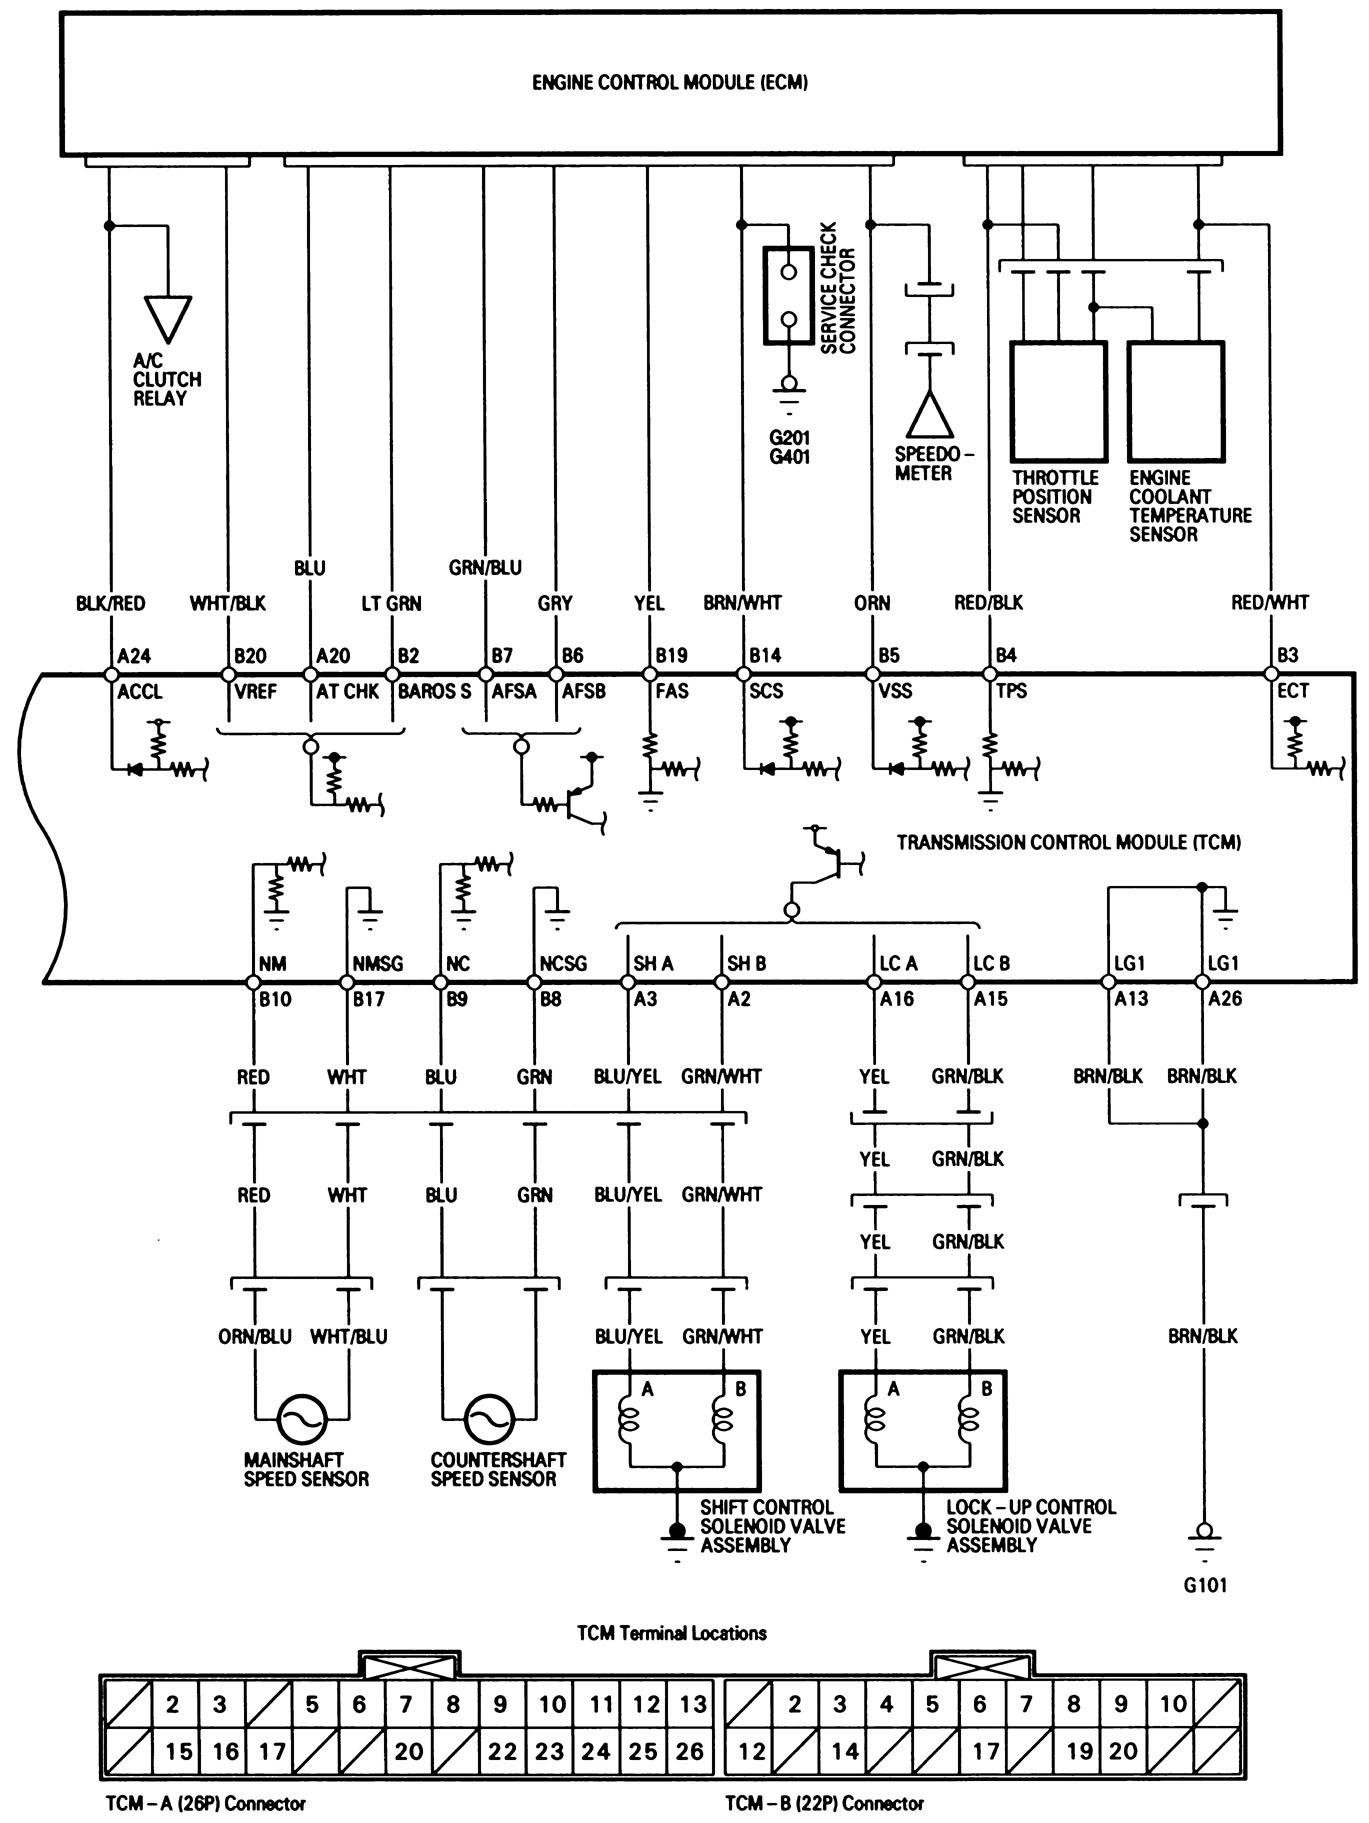 1999 acura integra fuse box diagram